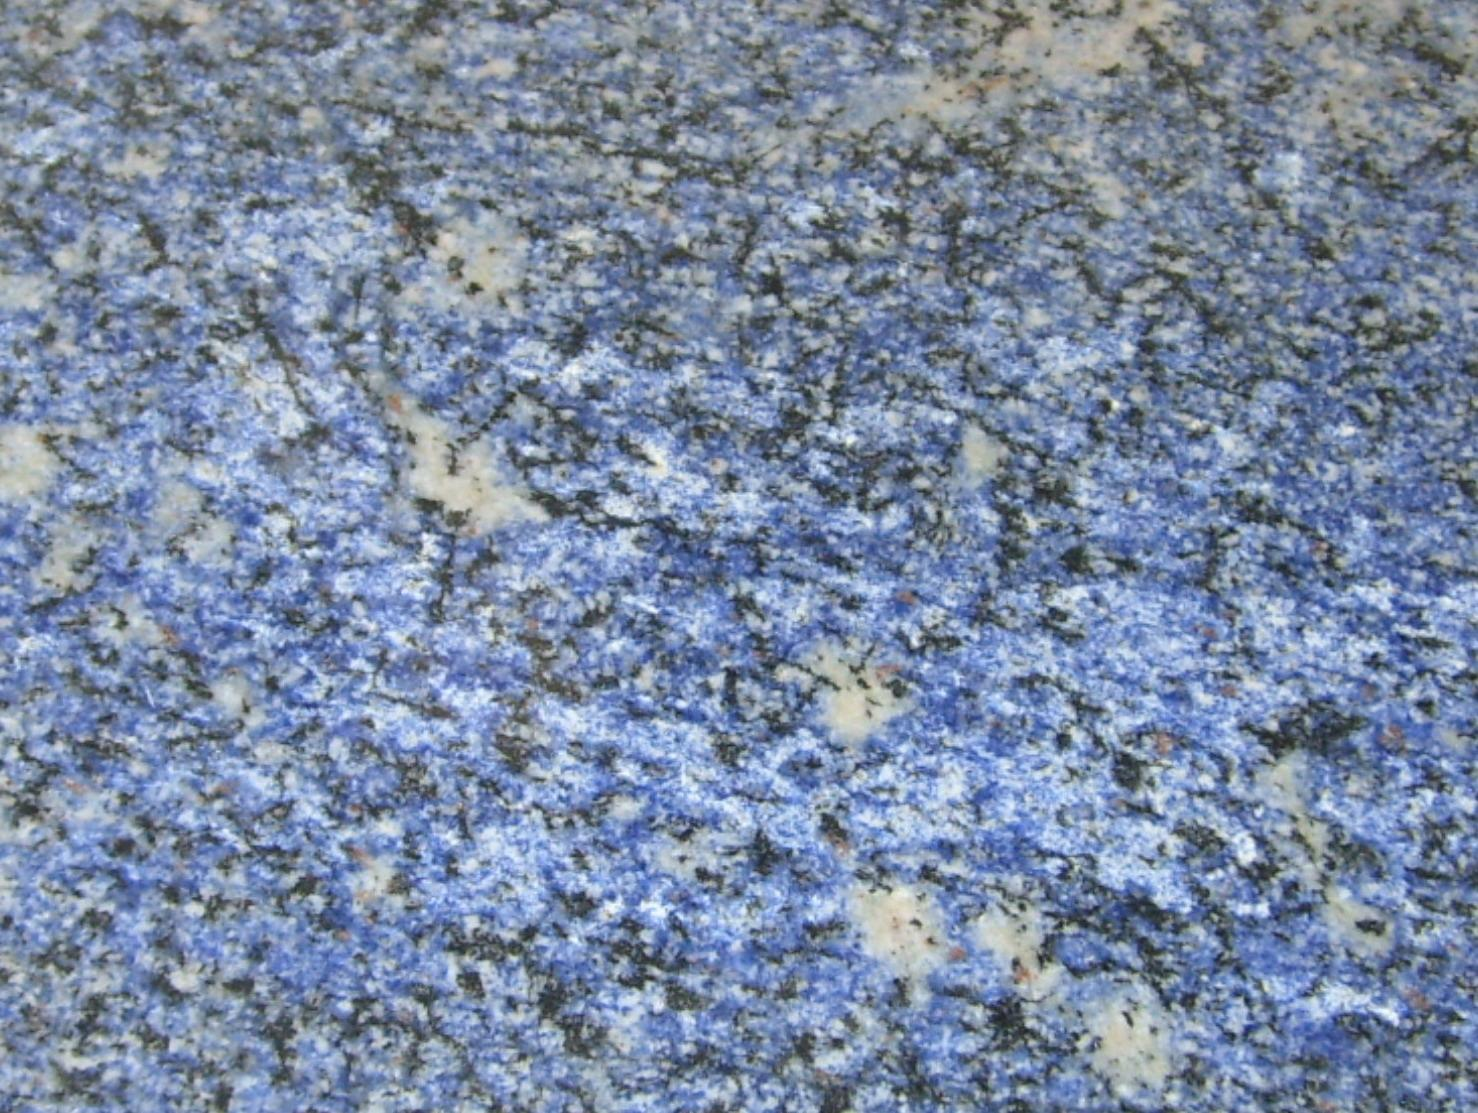 Blue Bahia Granite Tiles Slabs And Countertops Blue